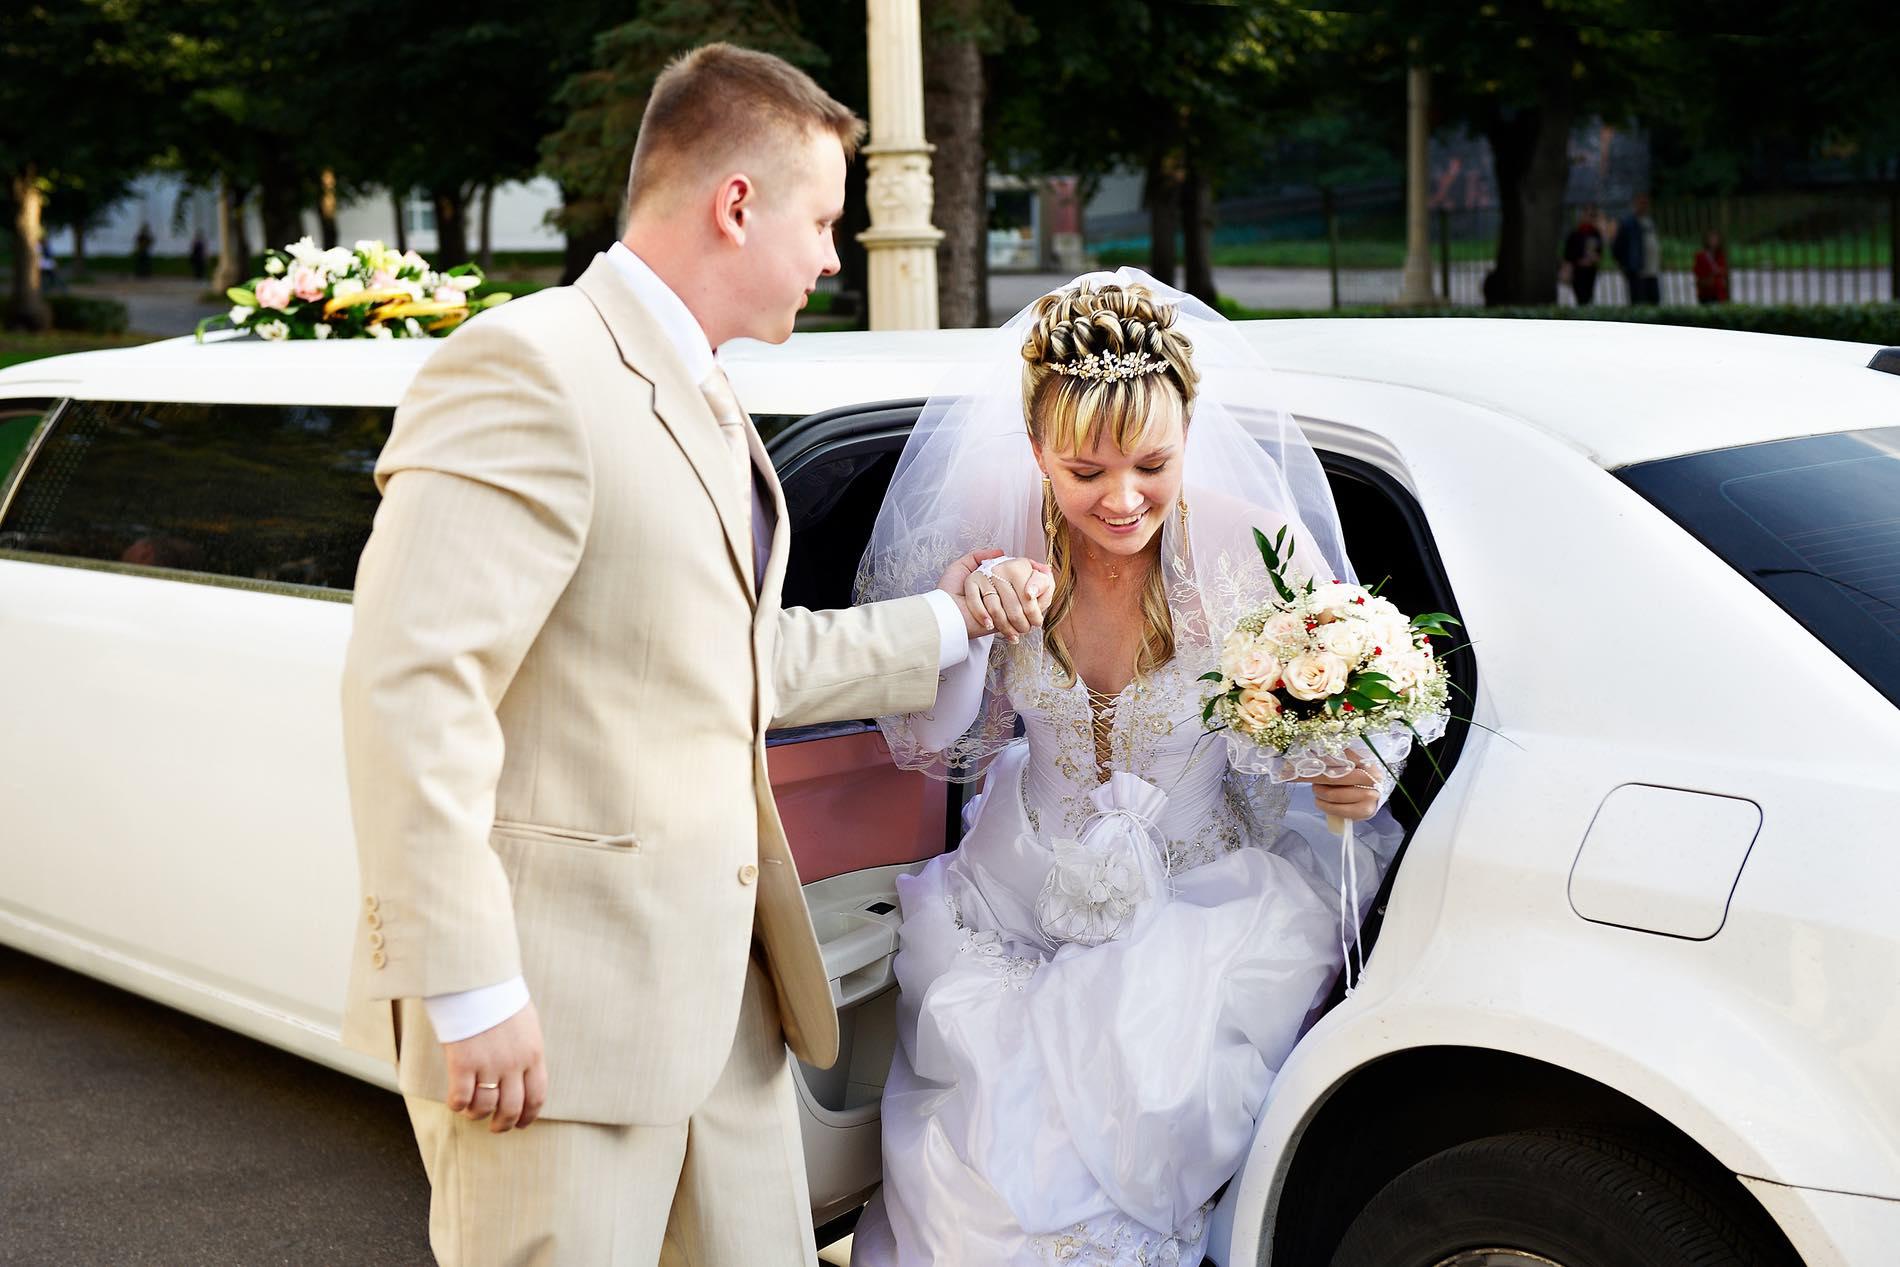 wedding limousine car